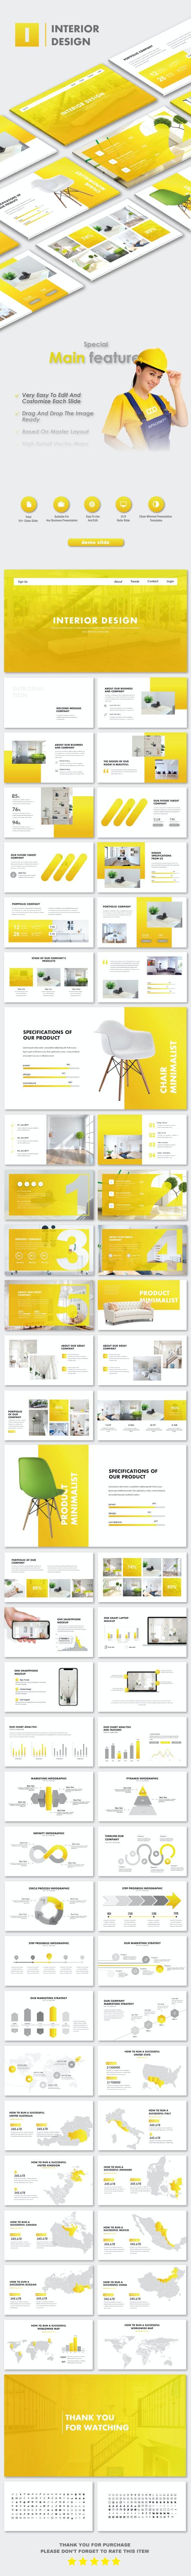 Interior Design PowerPoint Templates - Business PowerPoint Templates